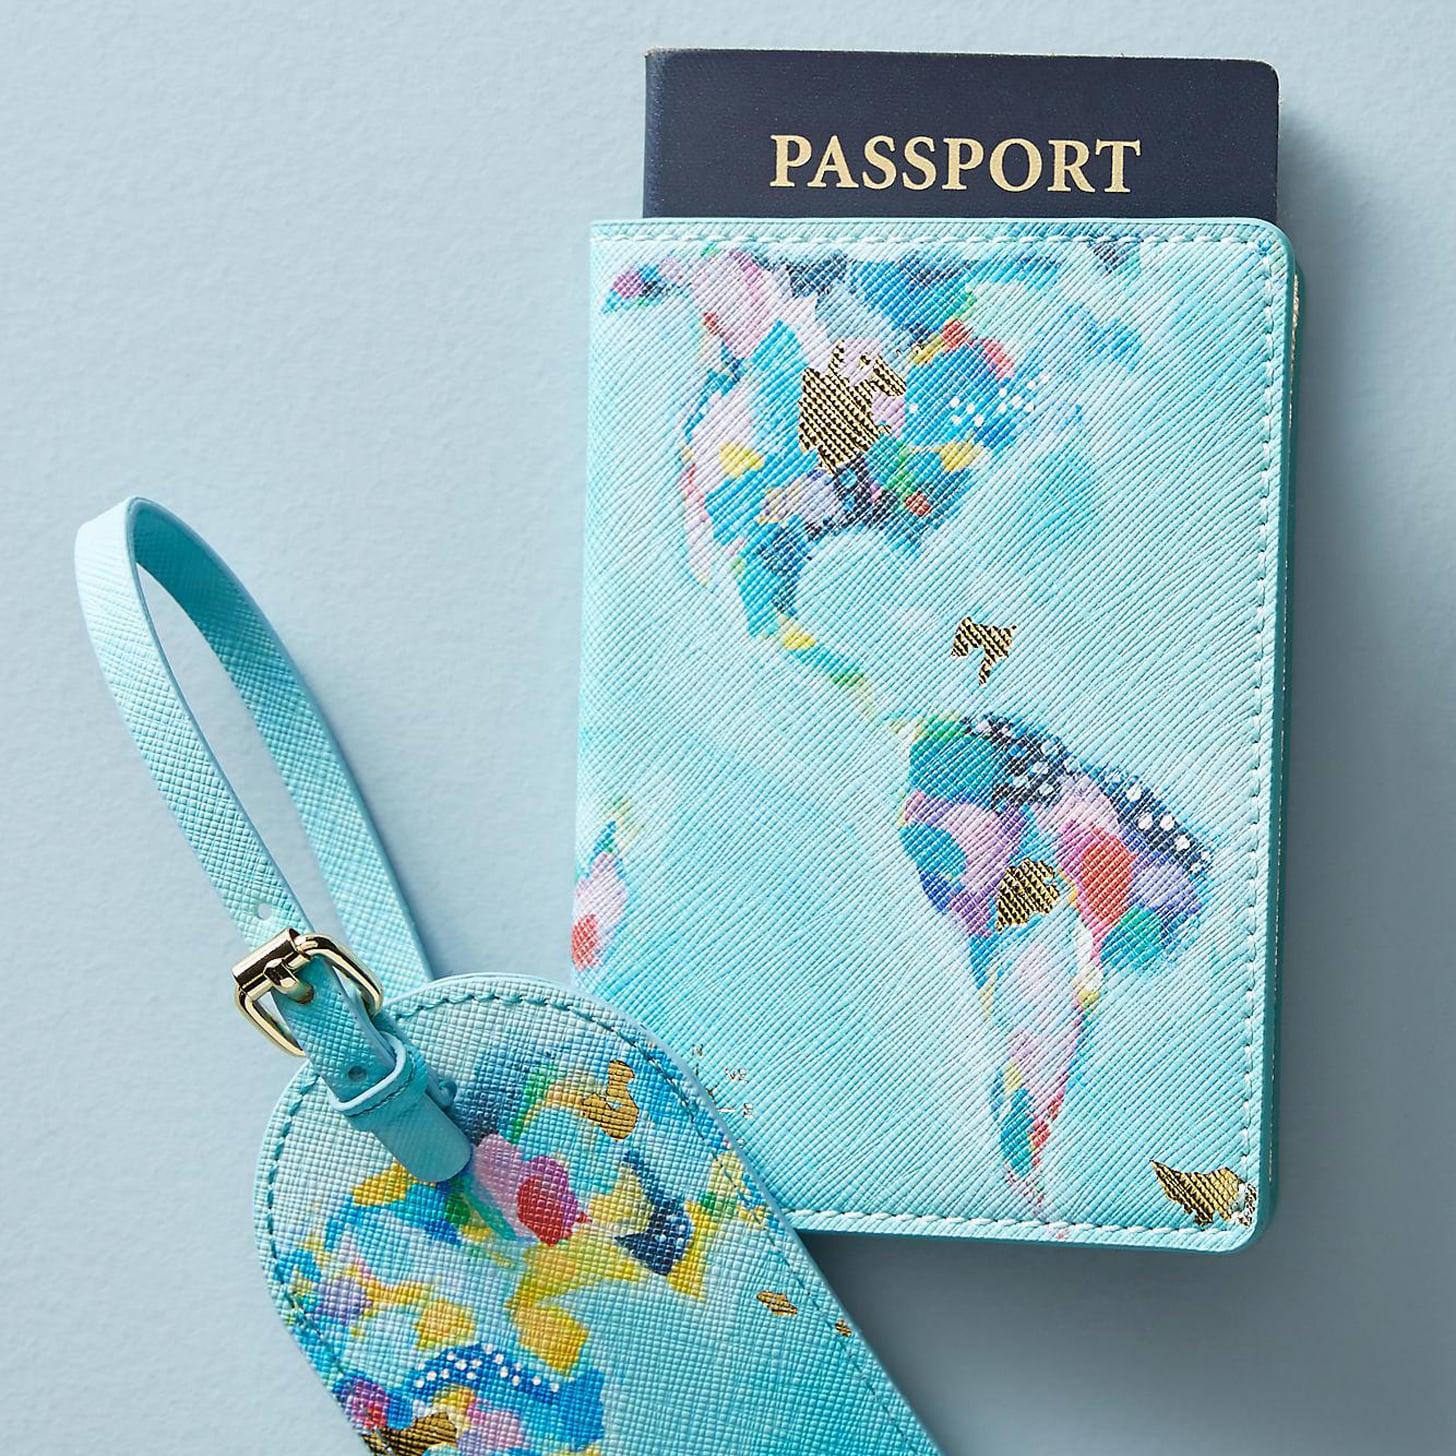 23289763d30bf Elodie Travel Wallet | Best Travel Accessories From Anthropologie |  POPSUGAR Smart Living Photo 79